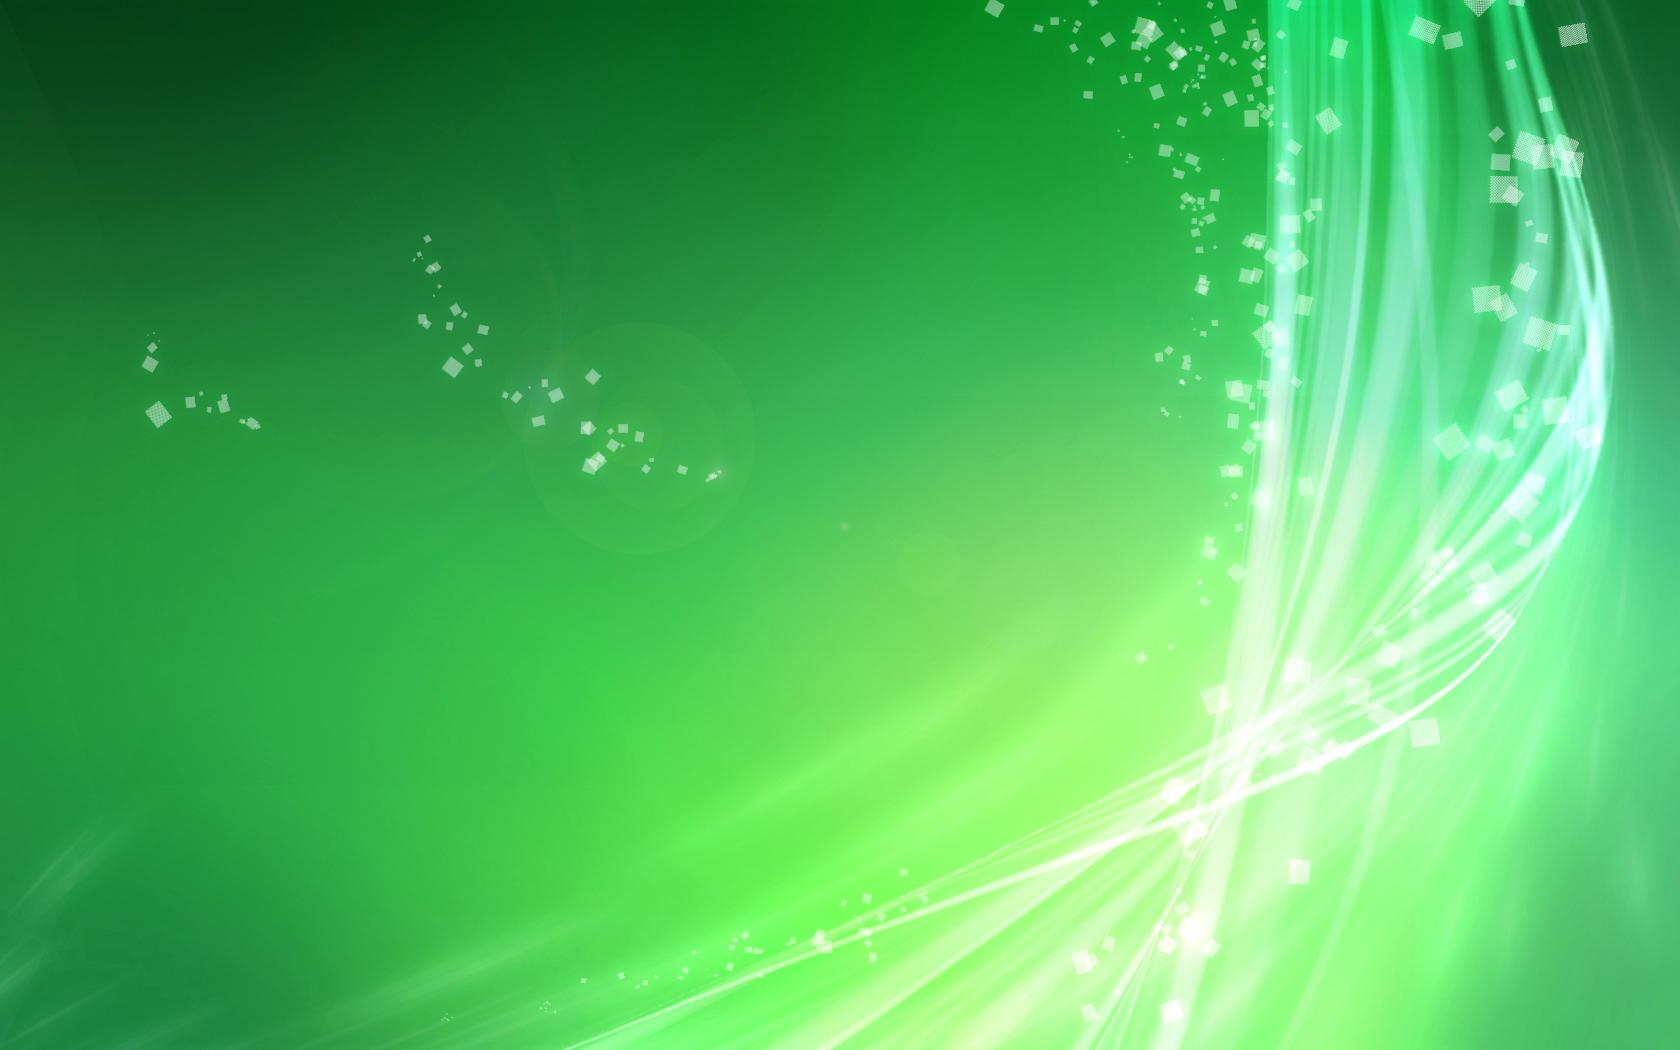 Light green wallpaper - SF Wallpaper